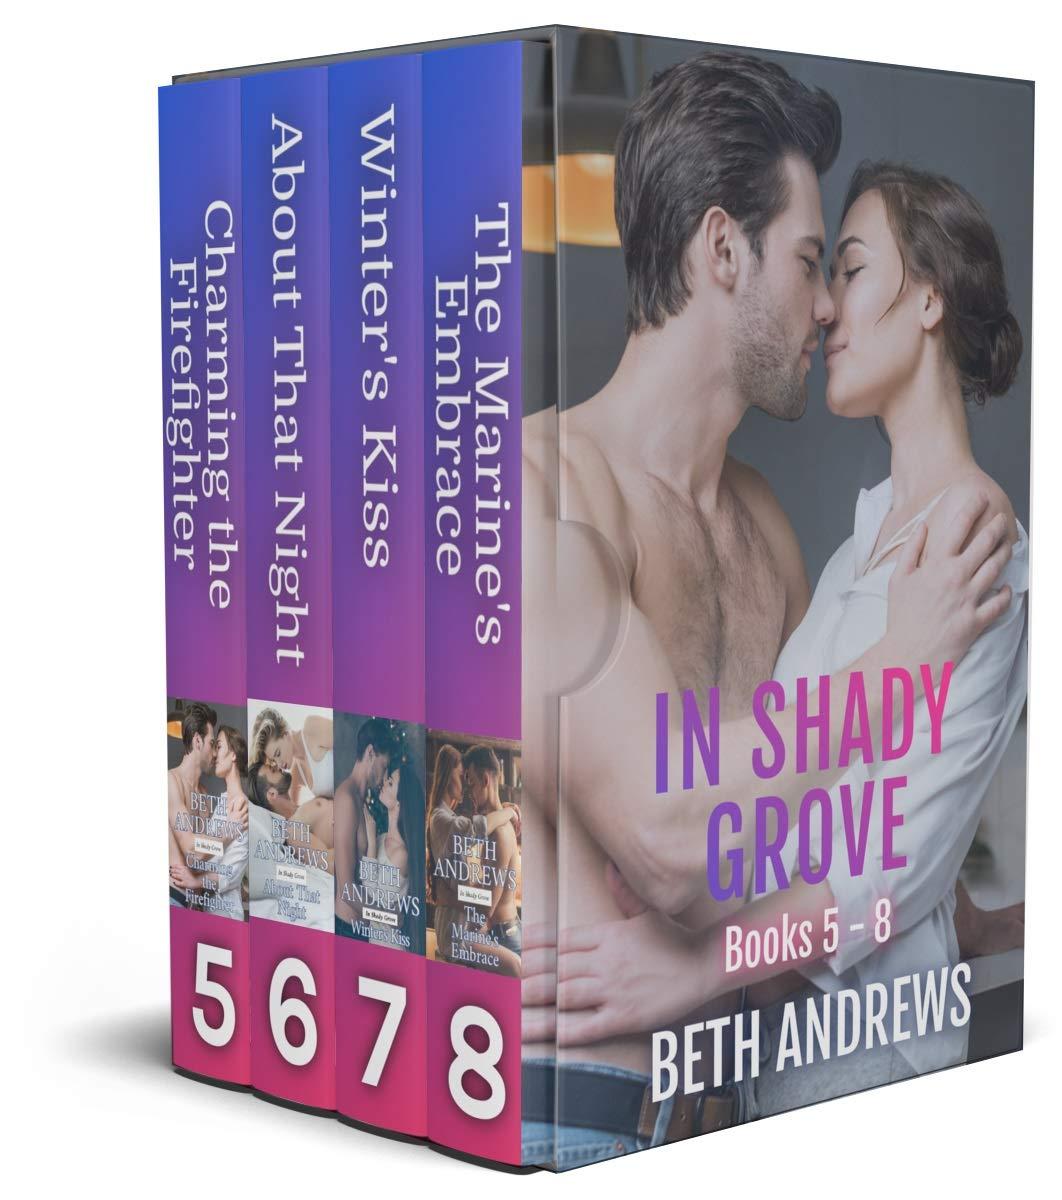 In Shady Grove Box Set 2: Books 5-8